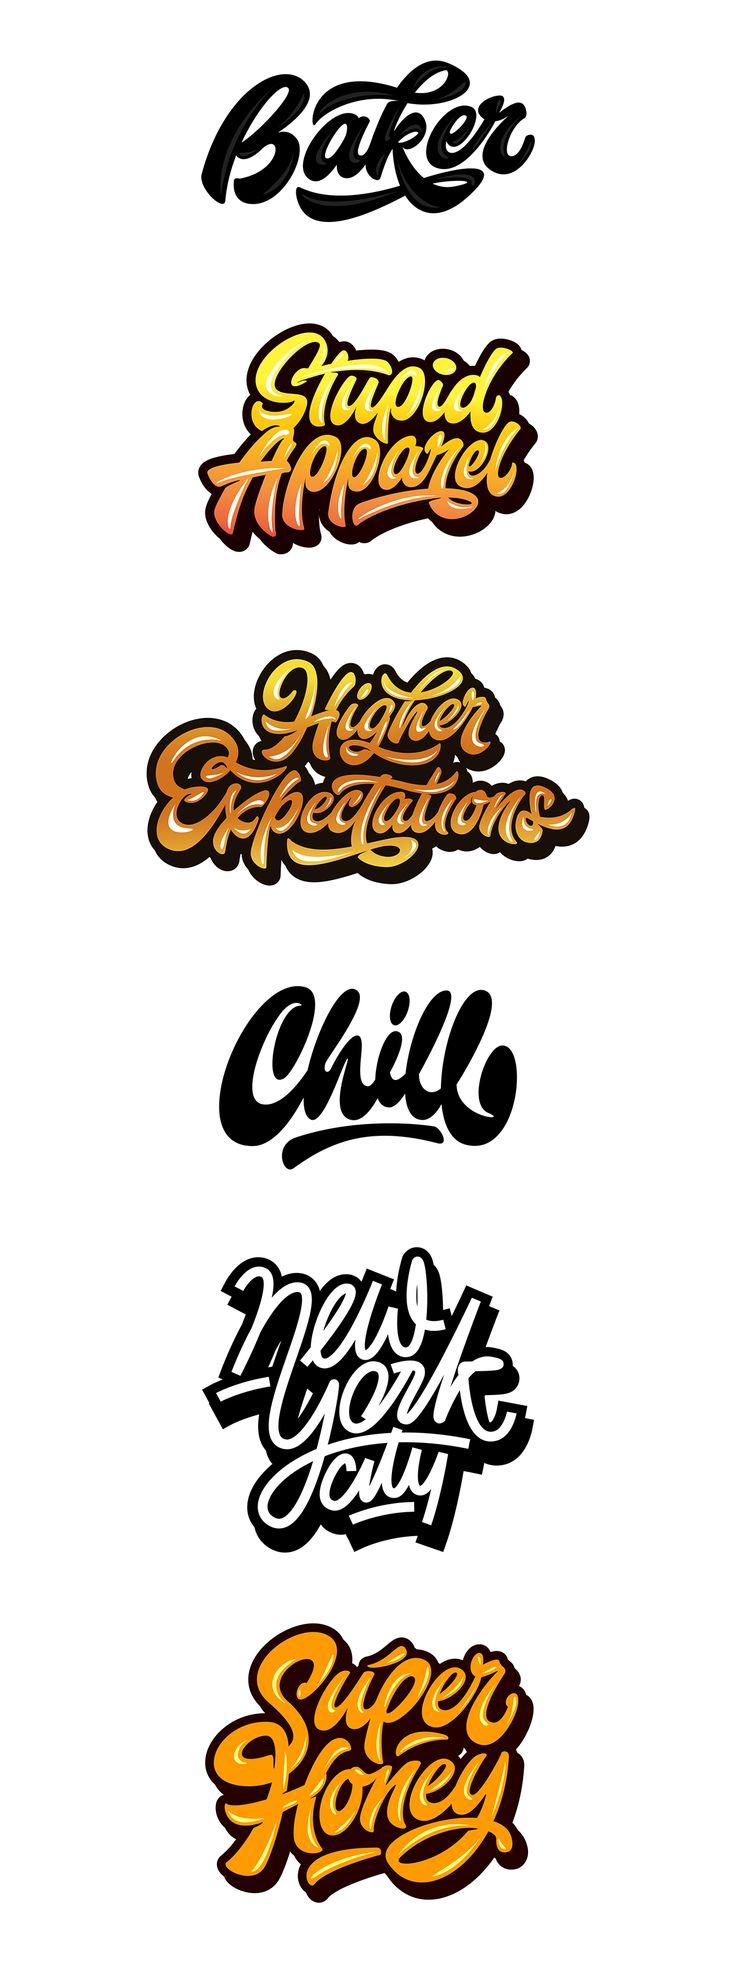 Kirill Richert on Behance http://jrstudioweb.com/diseno-grafico/diseno-de-logotipos/